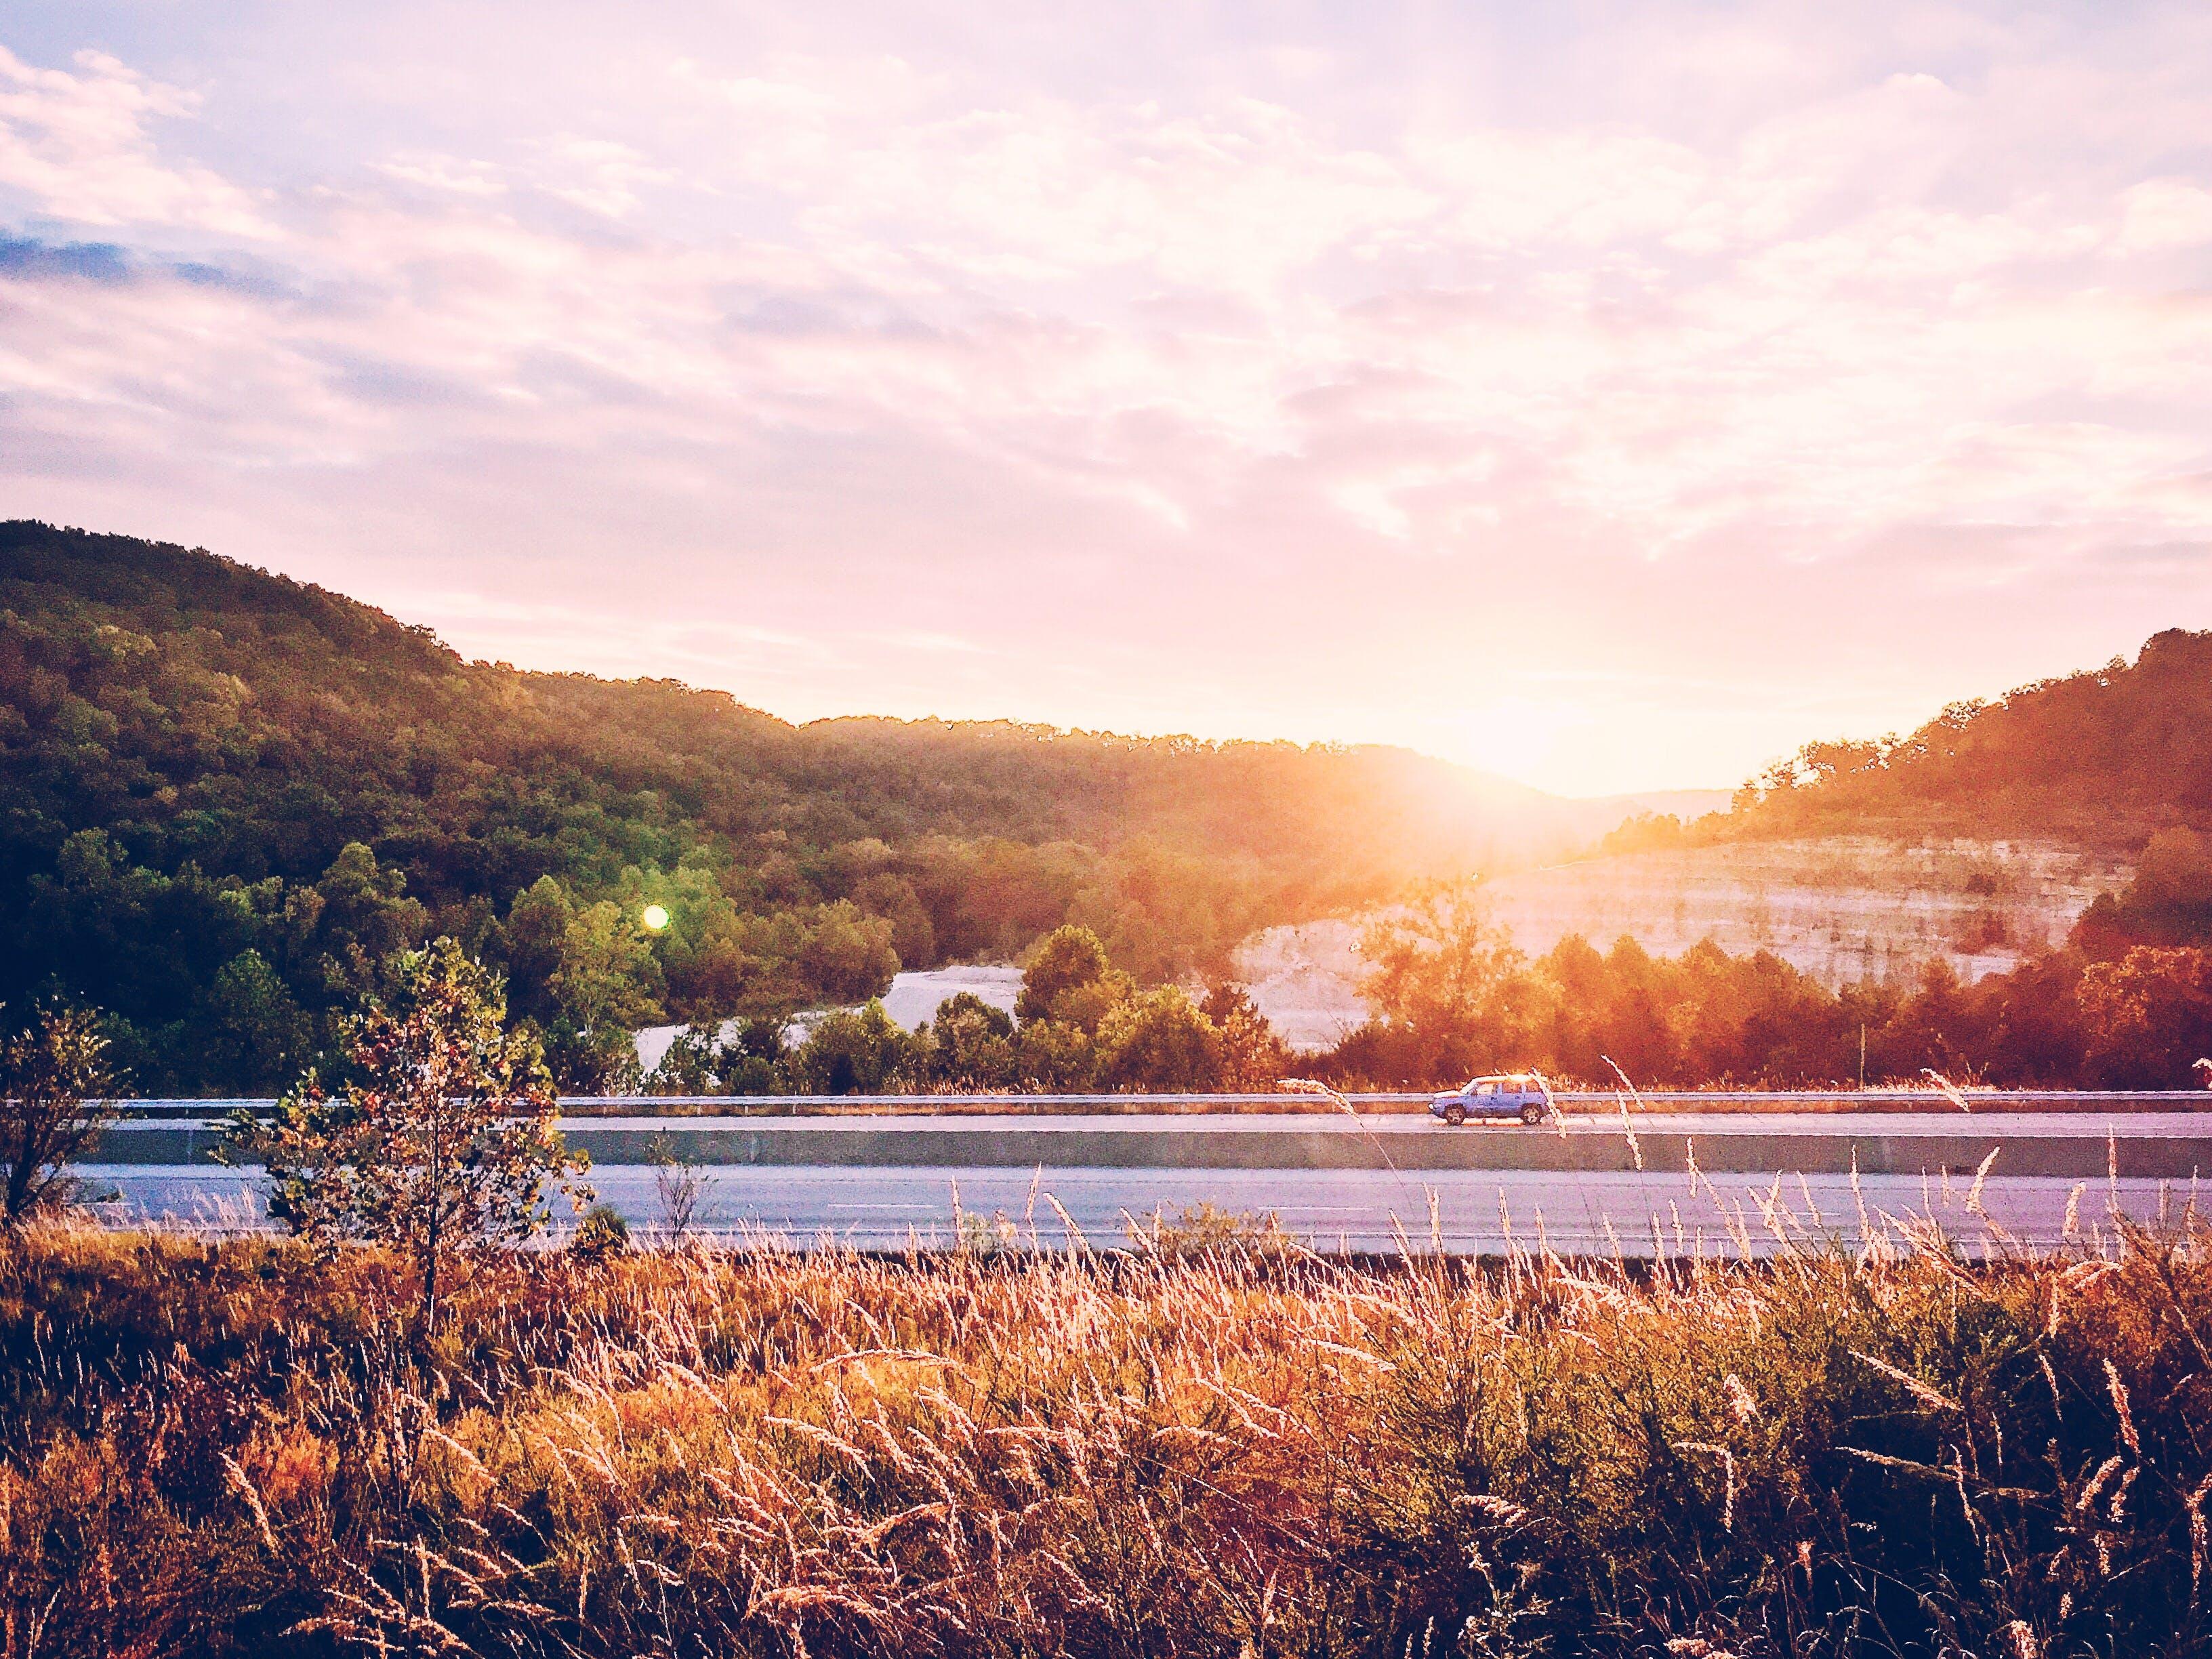 Kostenloses Stock Foto zu auto, autobahn, bäume, infrastruktur